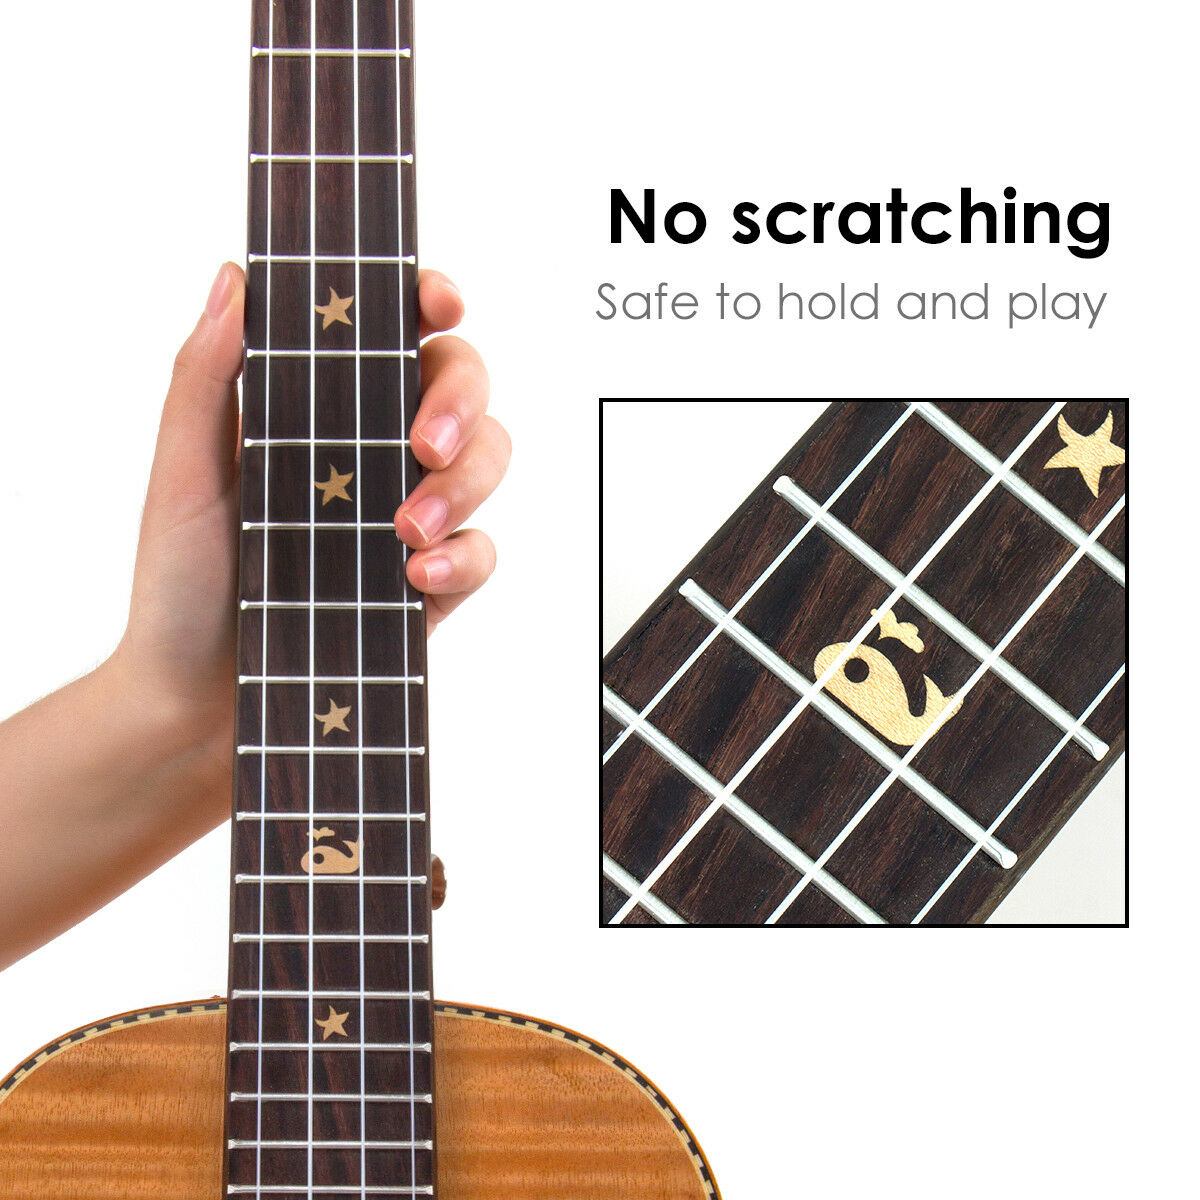 baritone ukulele 30 inch hawaii guitar with strap tuner gig bag mahogany kmise ebay. Black Bedroom Furniture Sets. Home Design Ideas